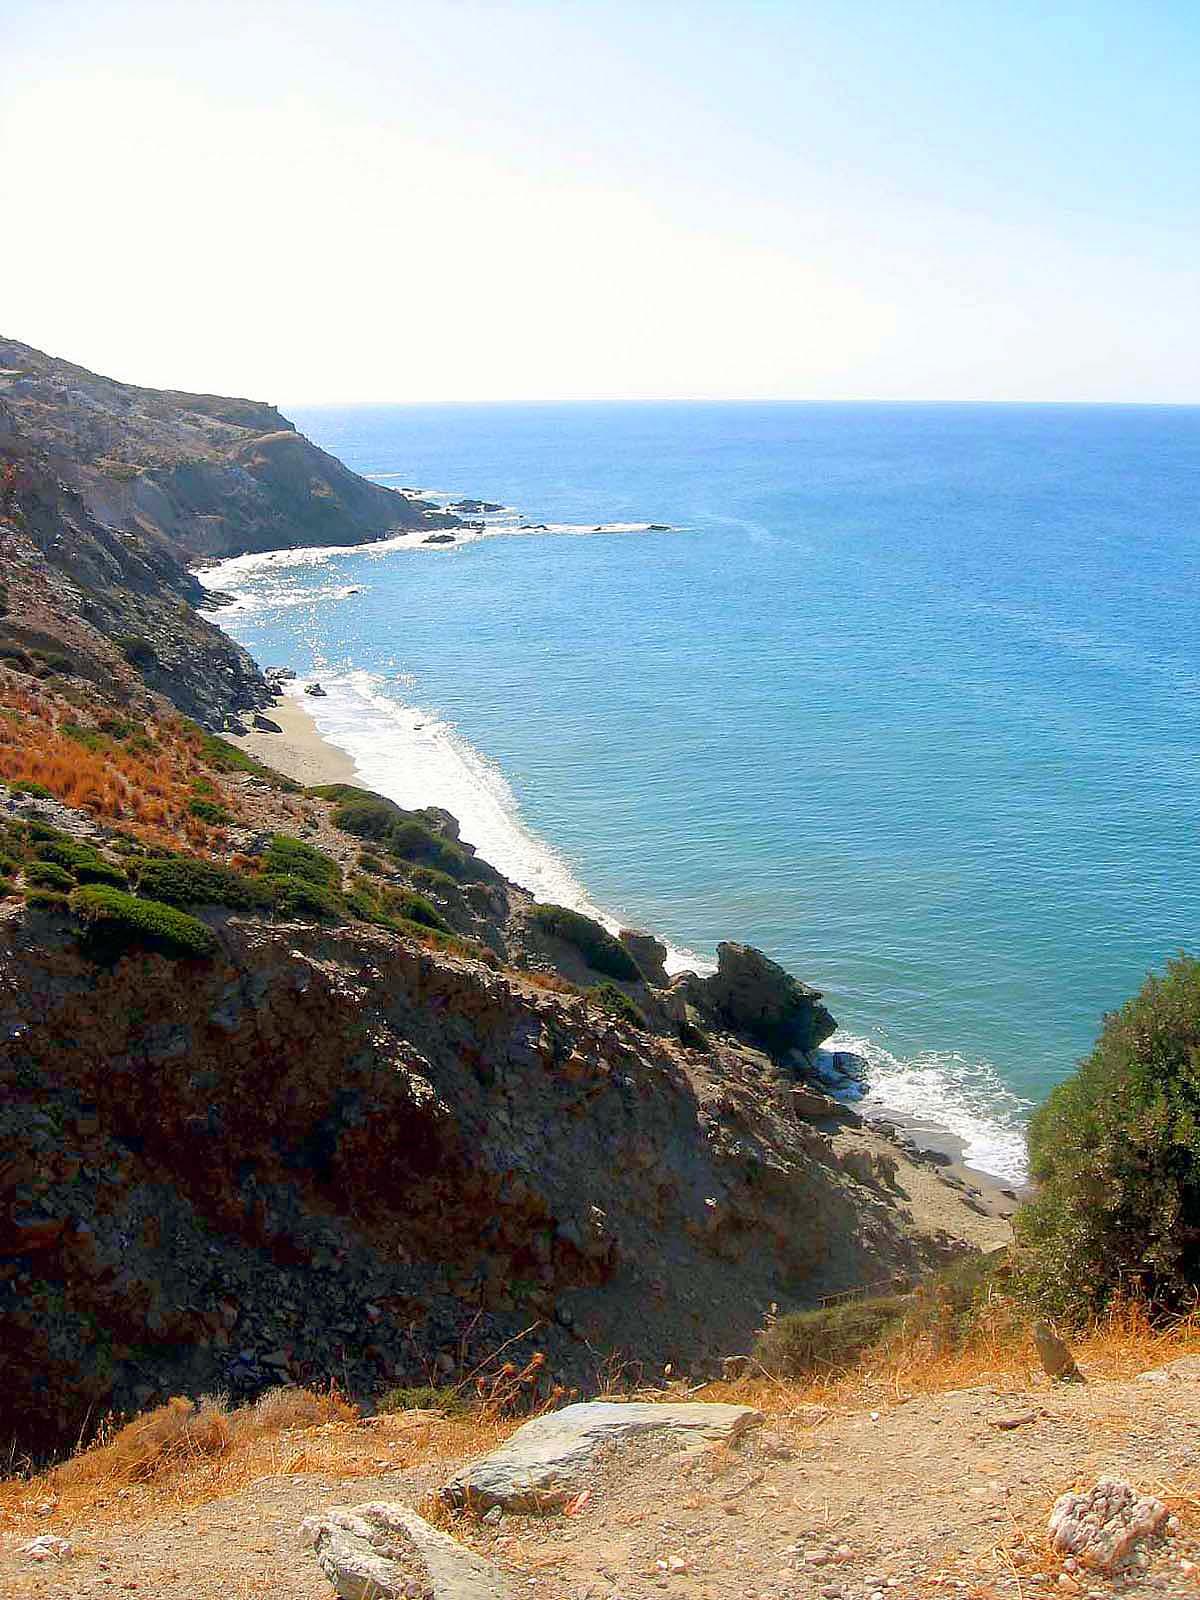 Coast of Milos island, Cyclades, Greece